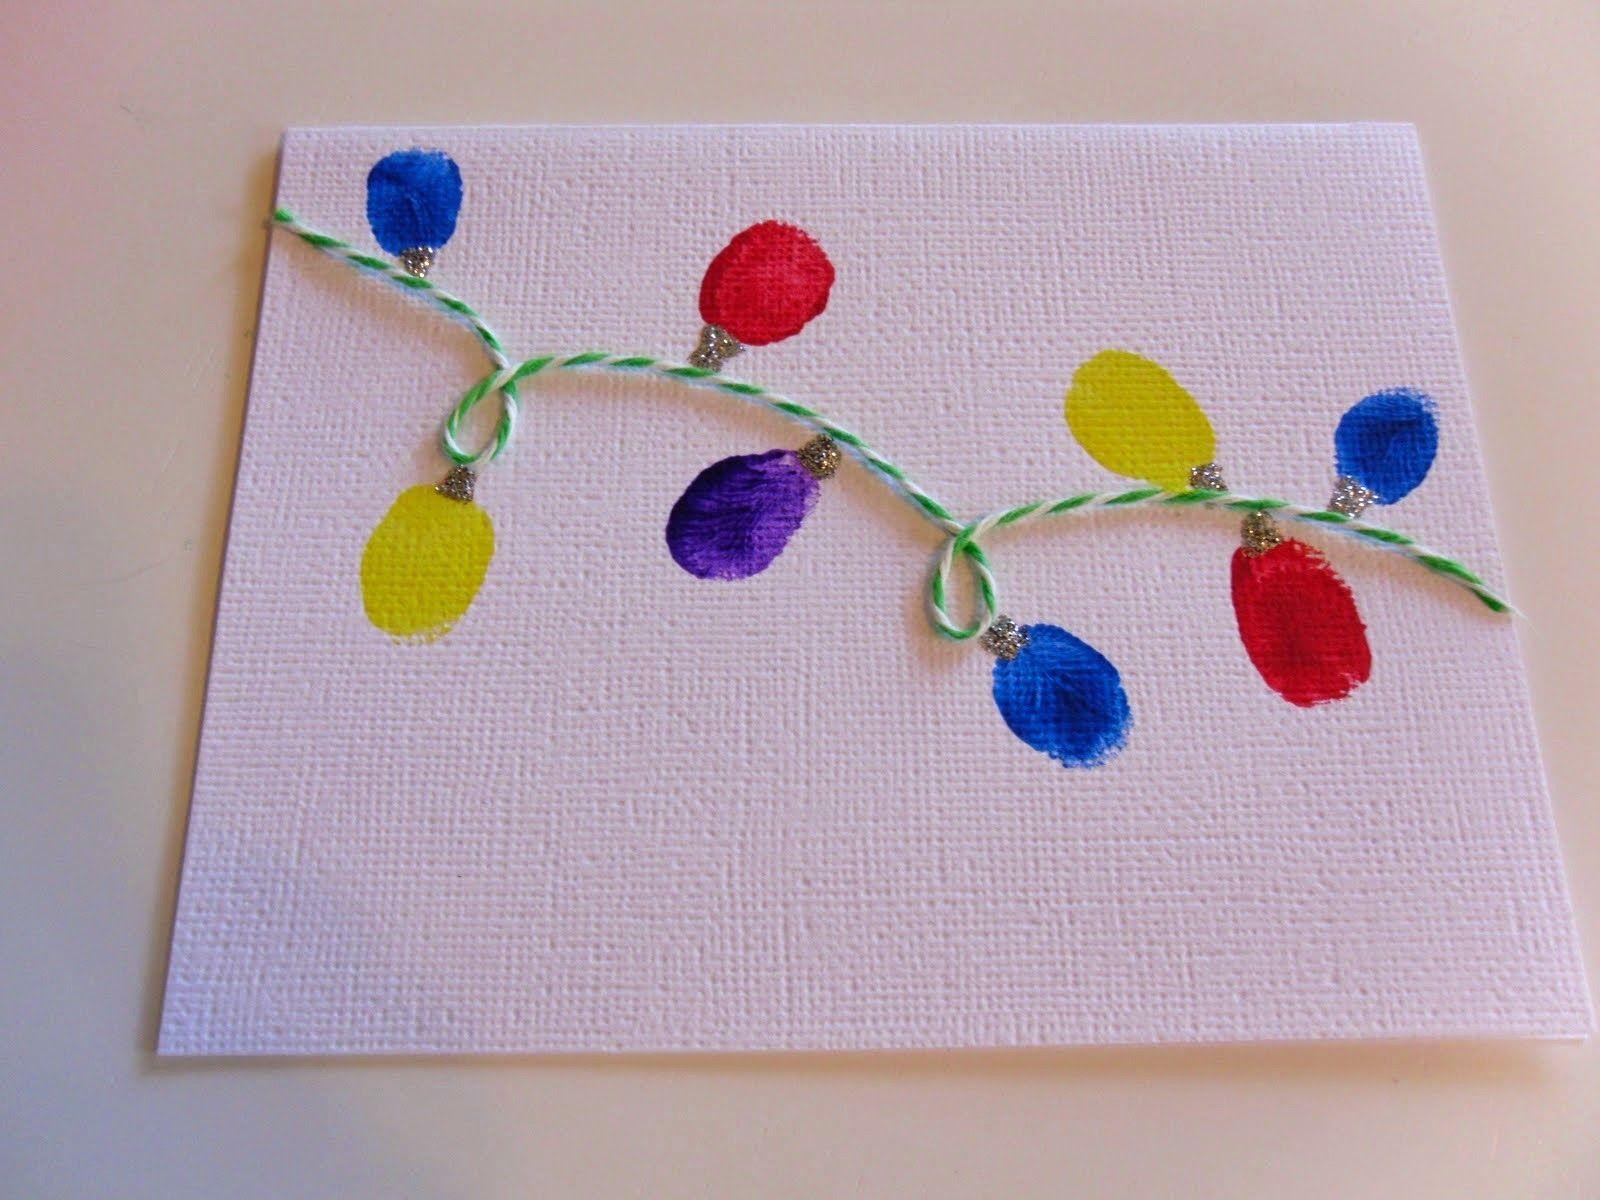 Simple Card Making Ideas Part - 20: Kids Card Making Ideas - Google Search